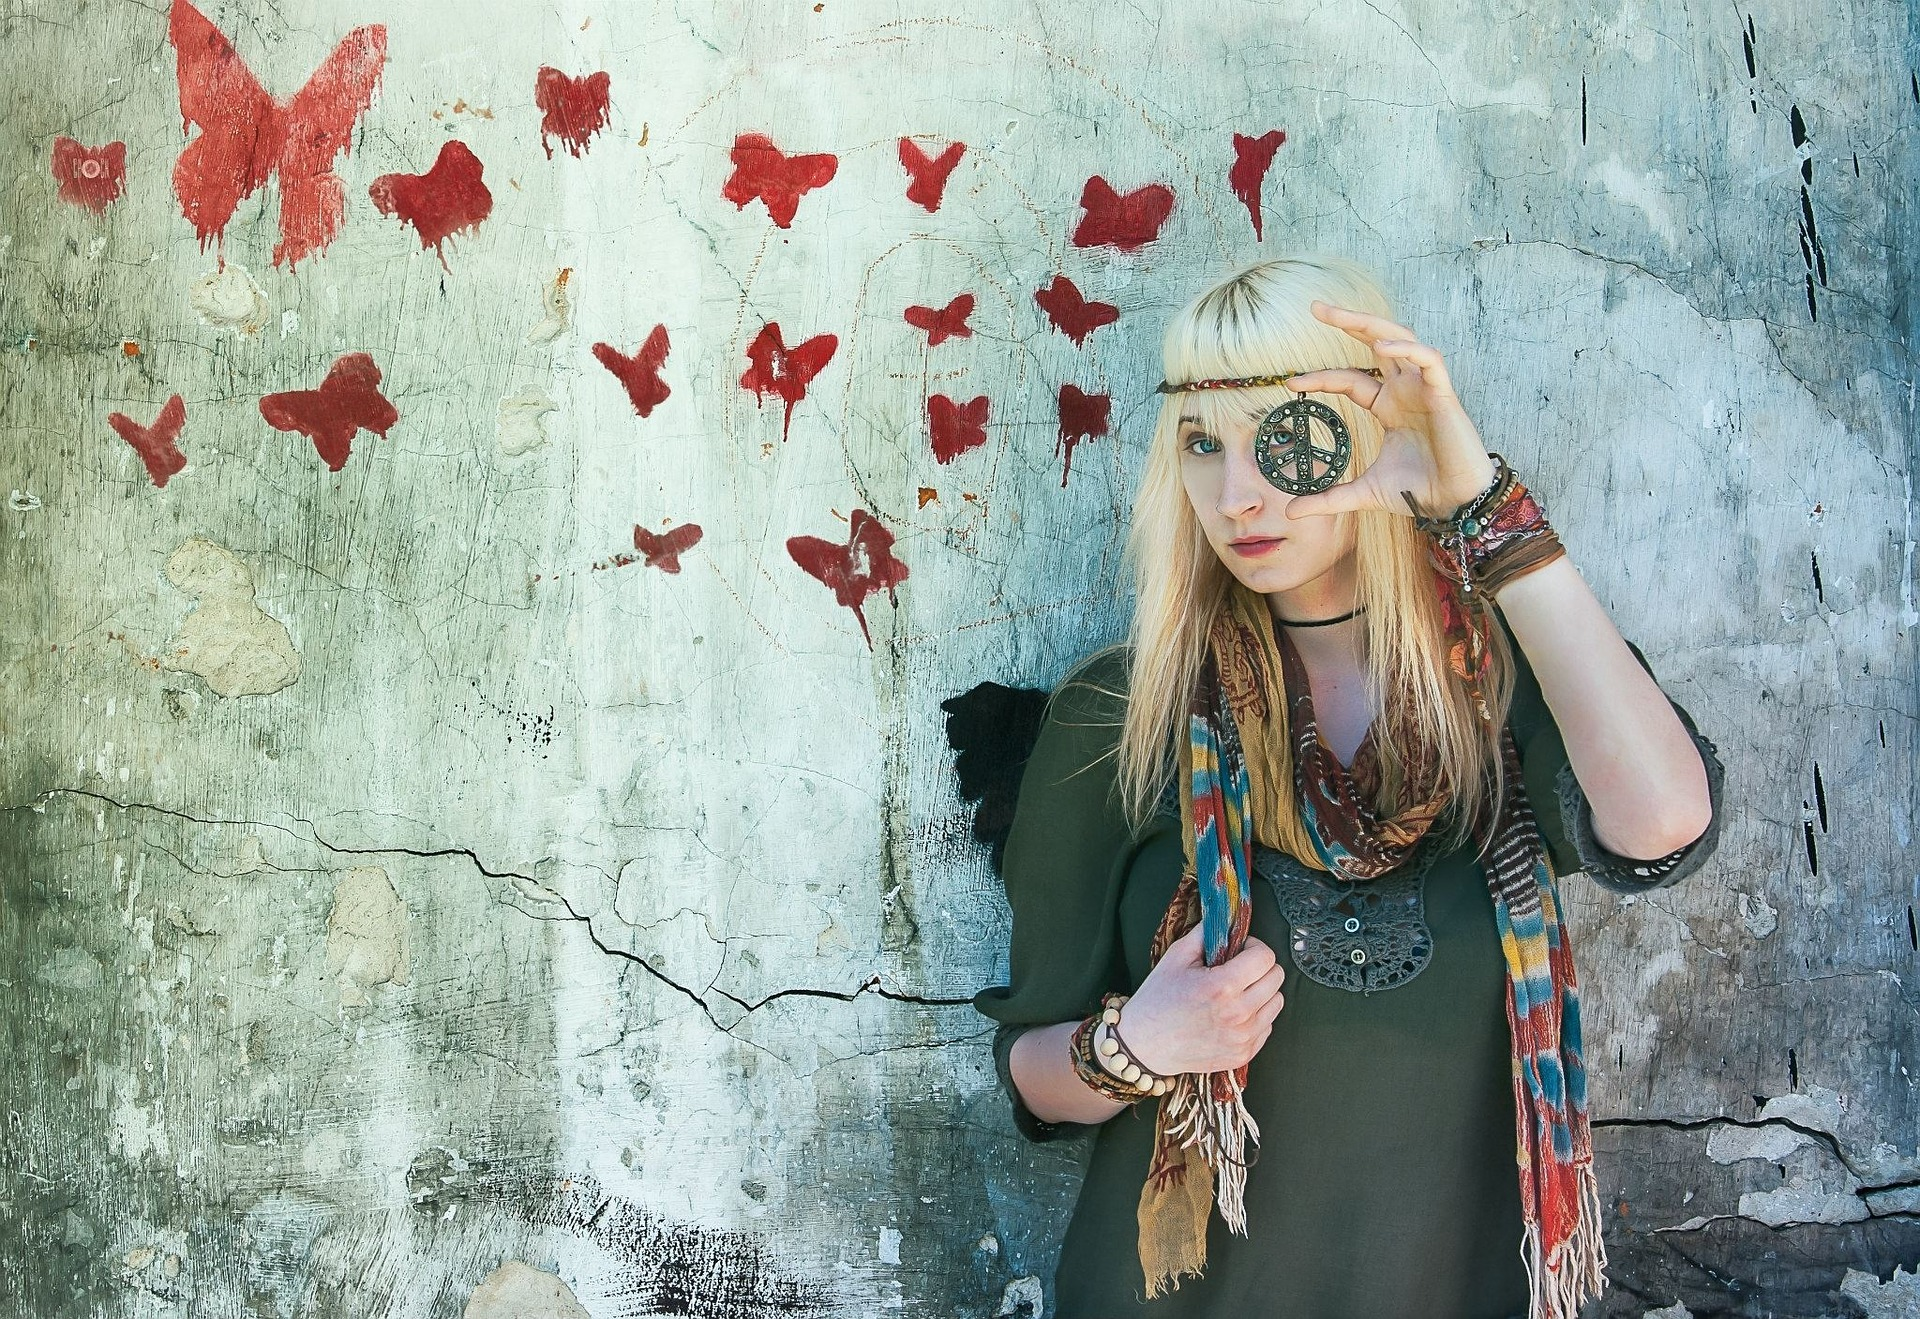 Pixabay - hippie